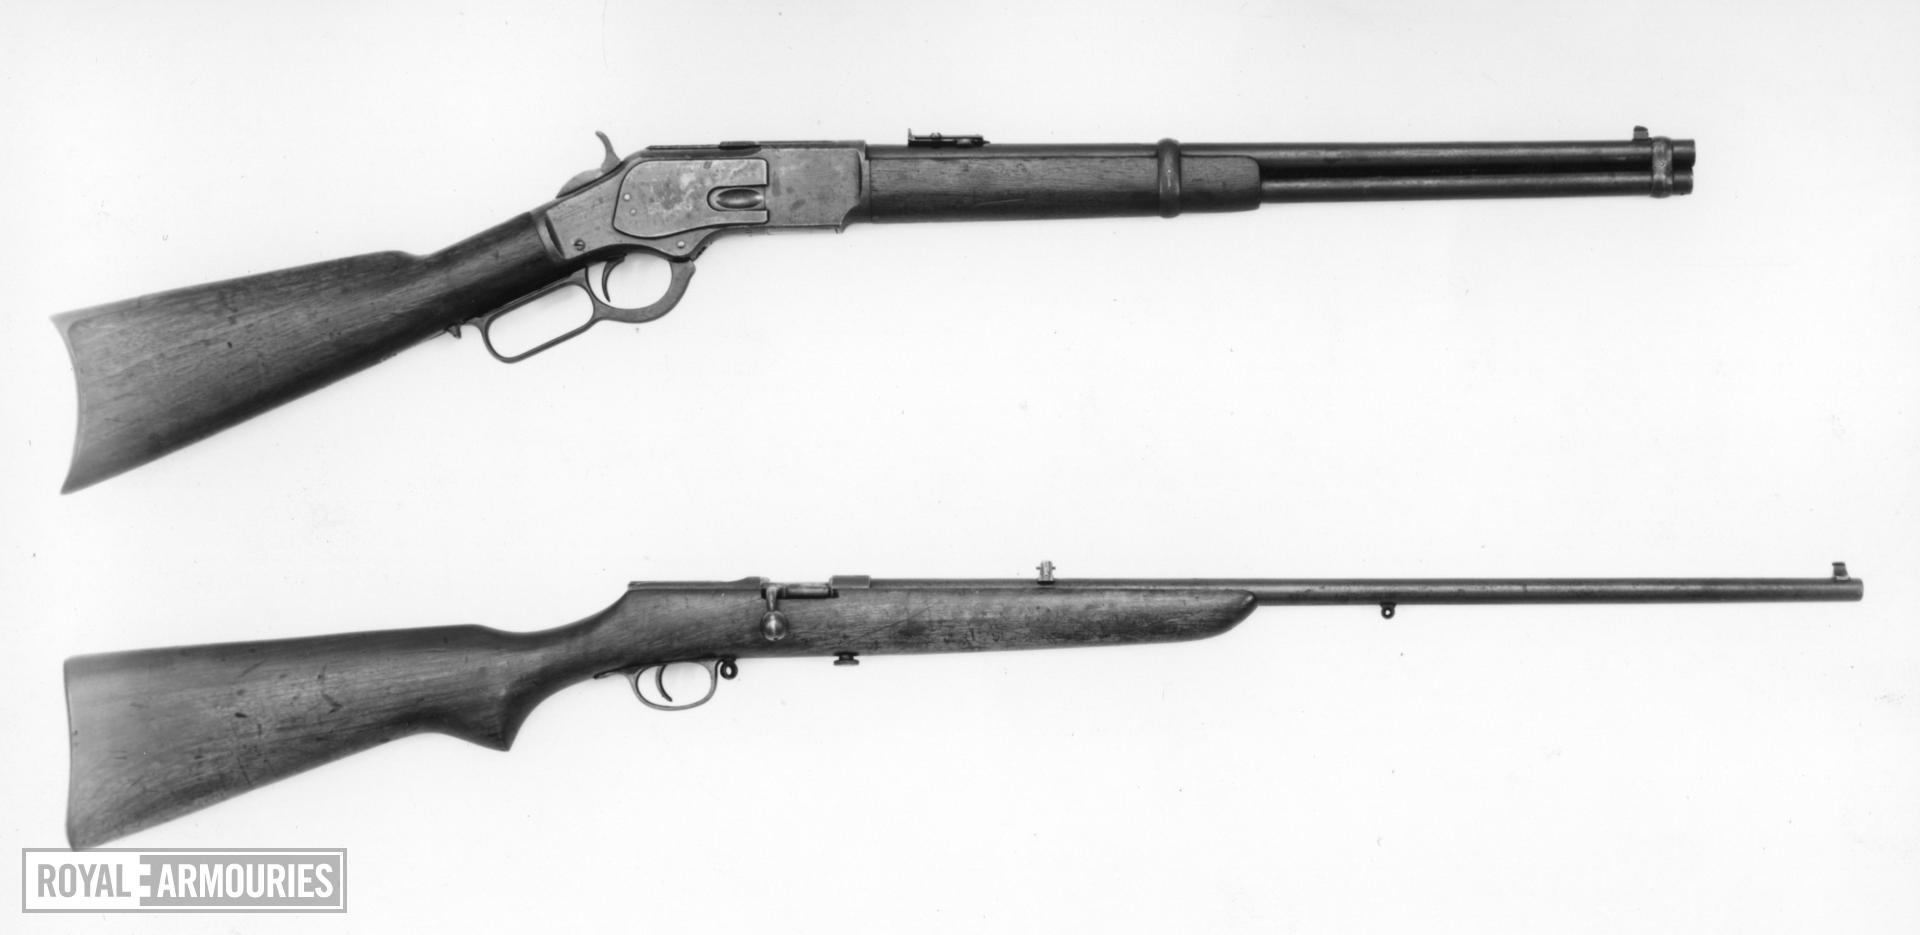 Centrefire lever-action magazine carbine - Winchester Model 1873